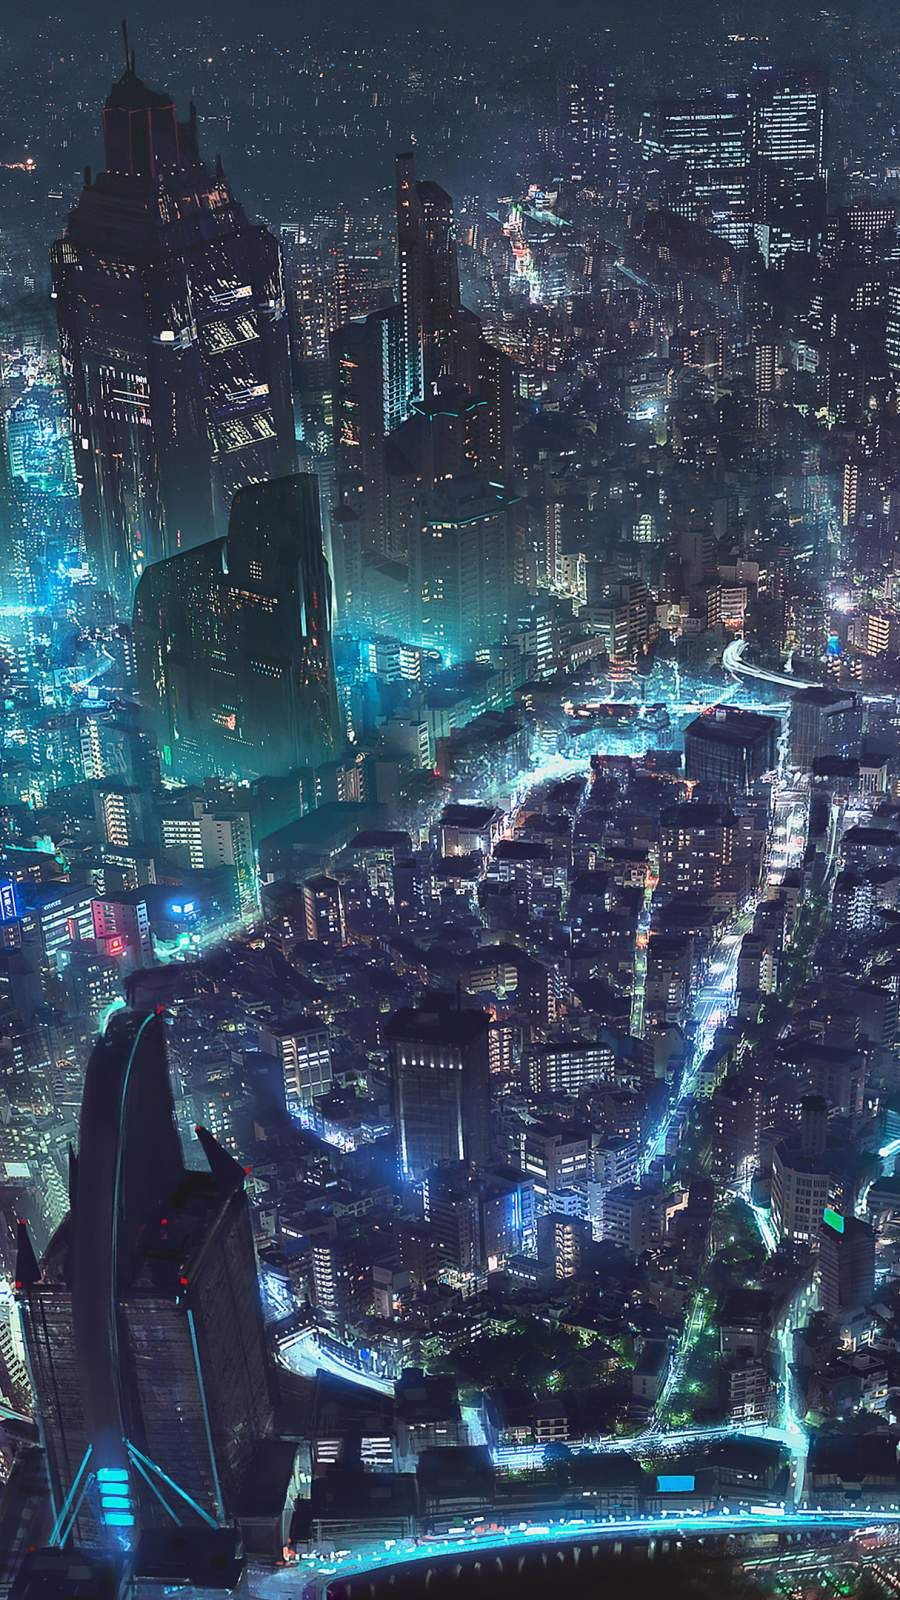 Cyberpunk City Iphone Wallpaper City Iphone Wallpaper Cyberpunk City Iphone Wallpaper